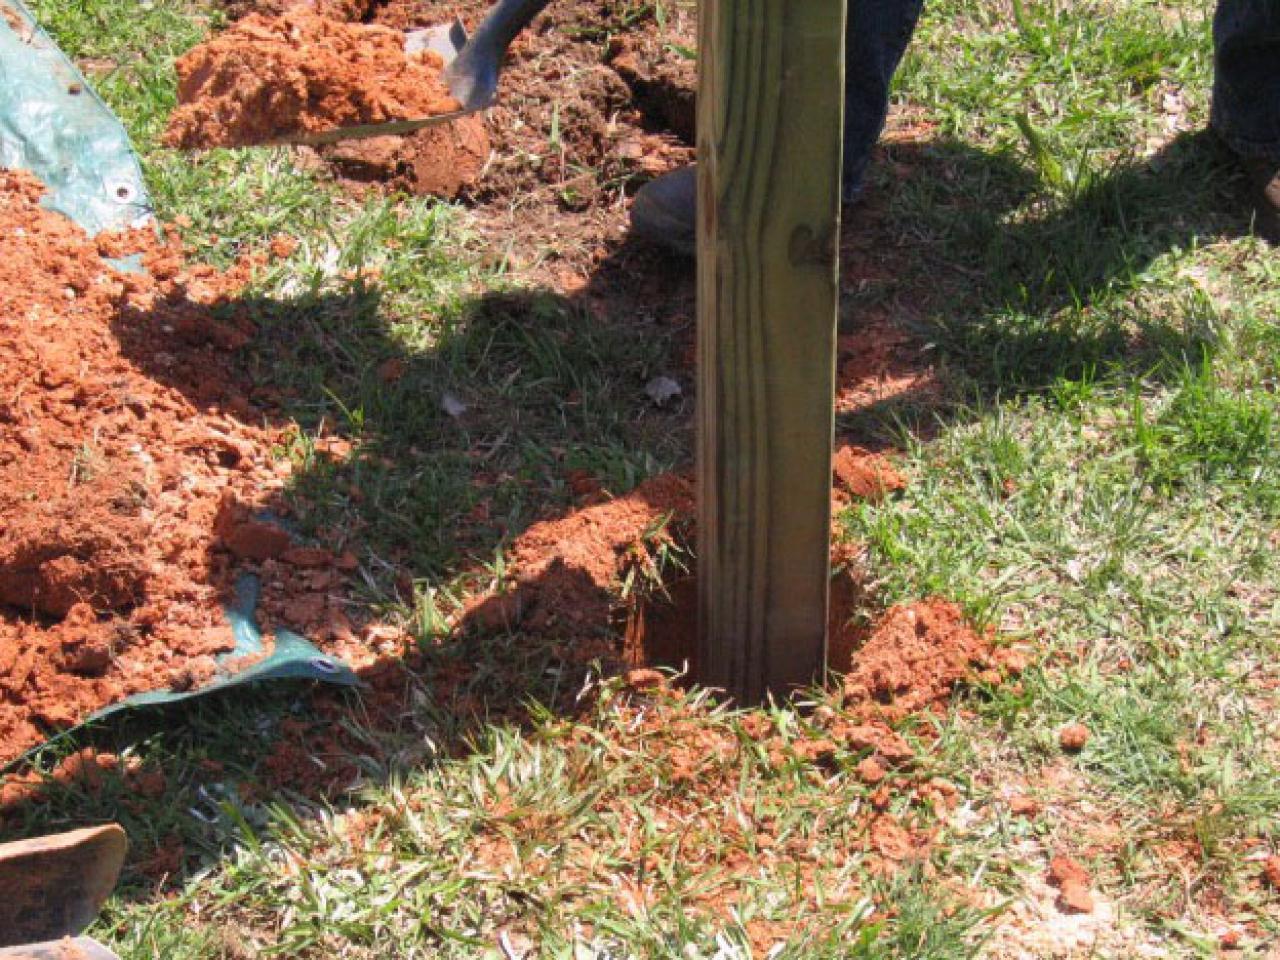 How to Plant Blackberries | how-tos | DIY